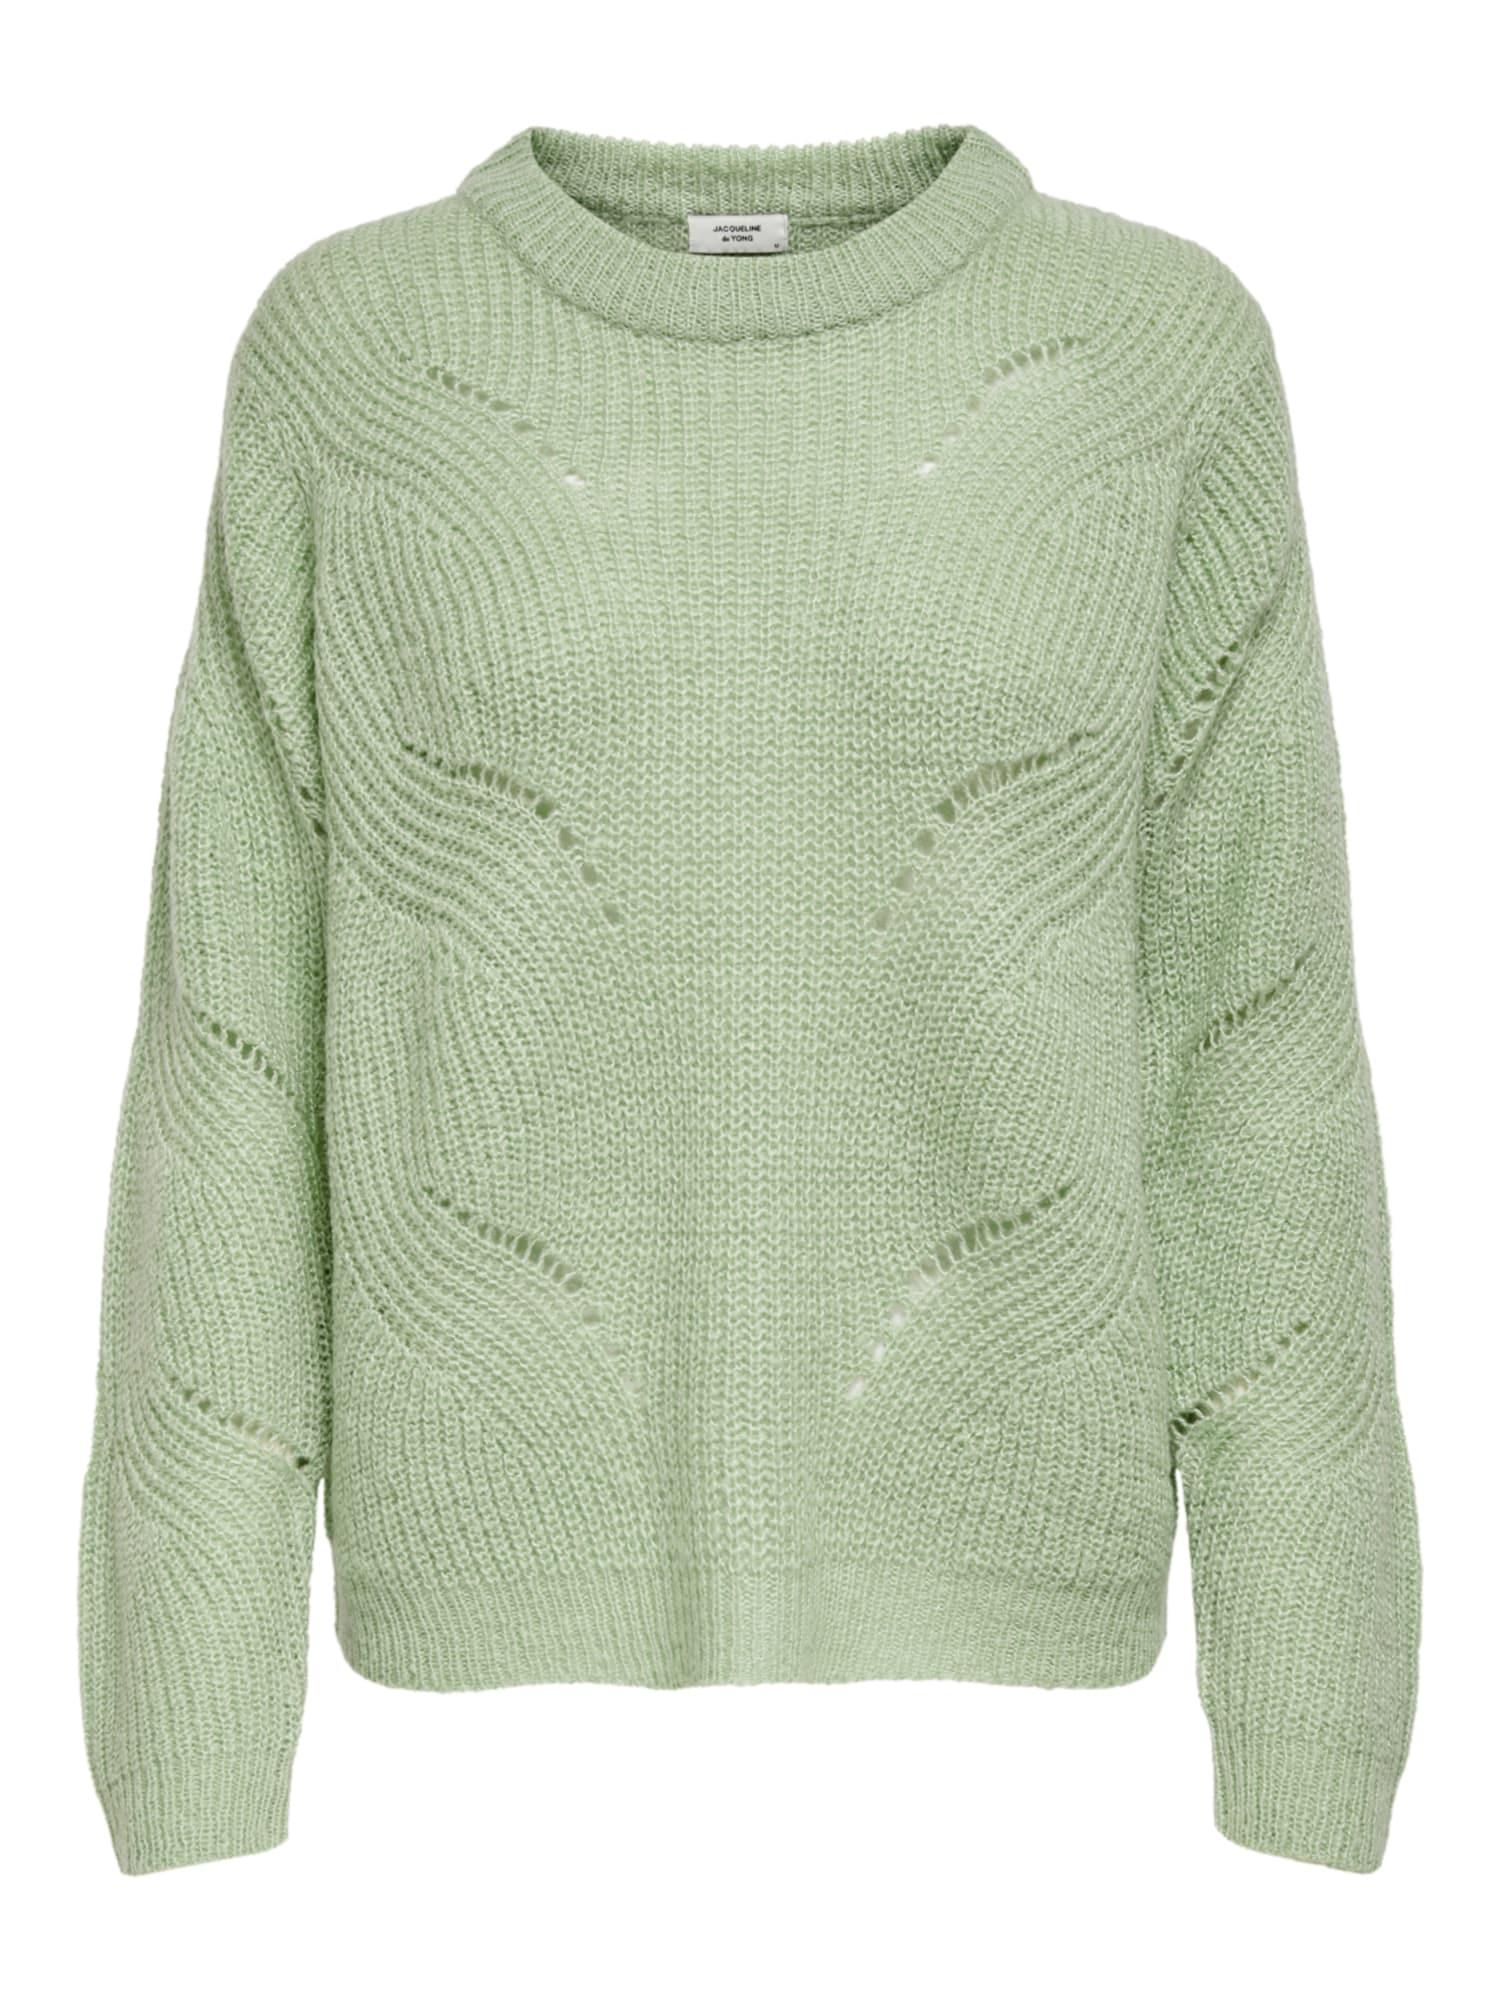 JACQUELINE de YONG Megztinis žalia